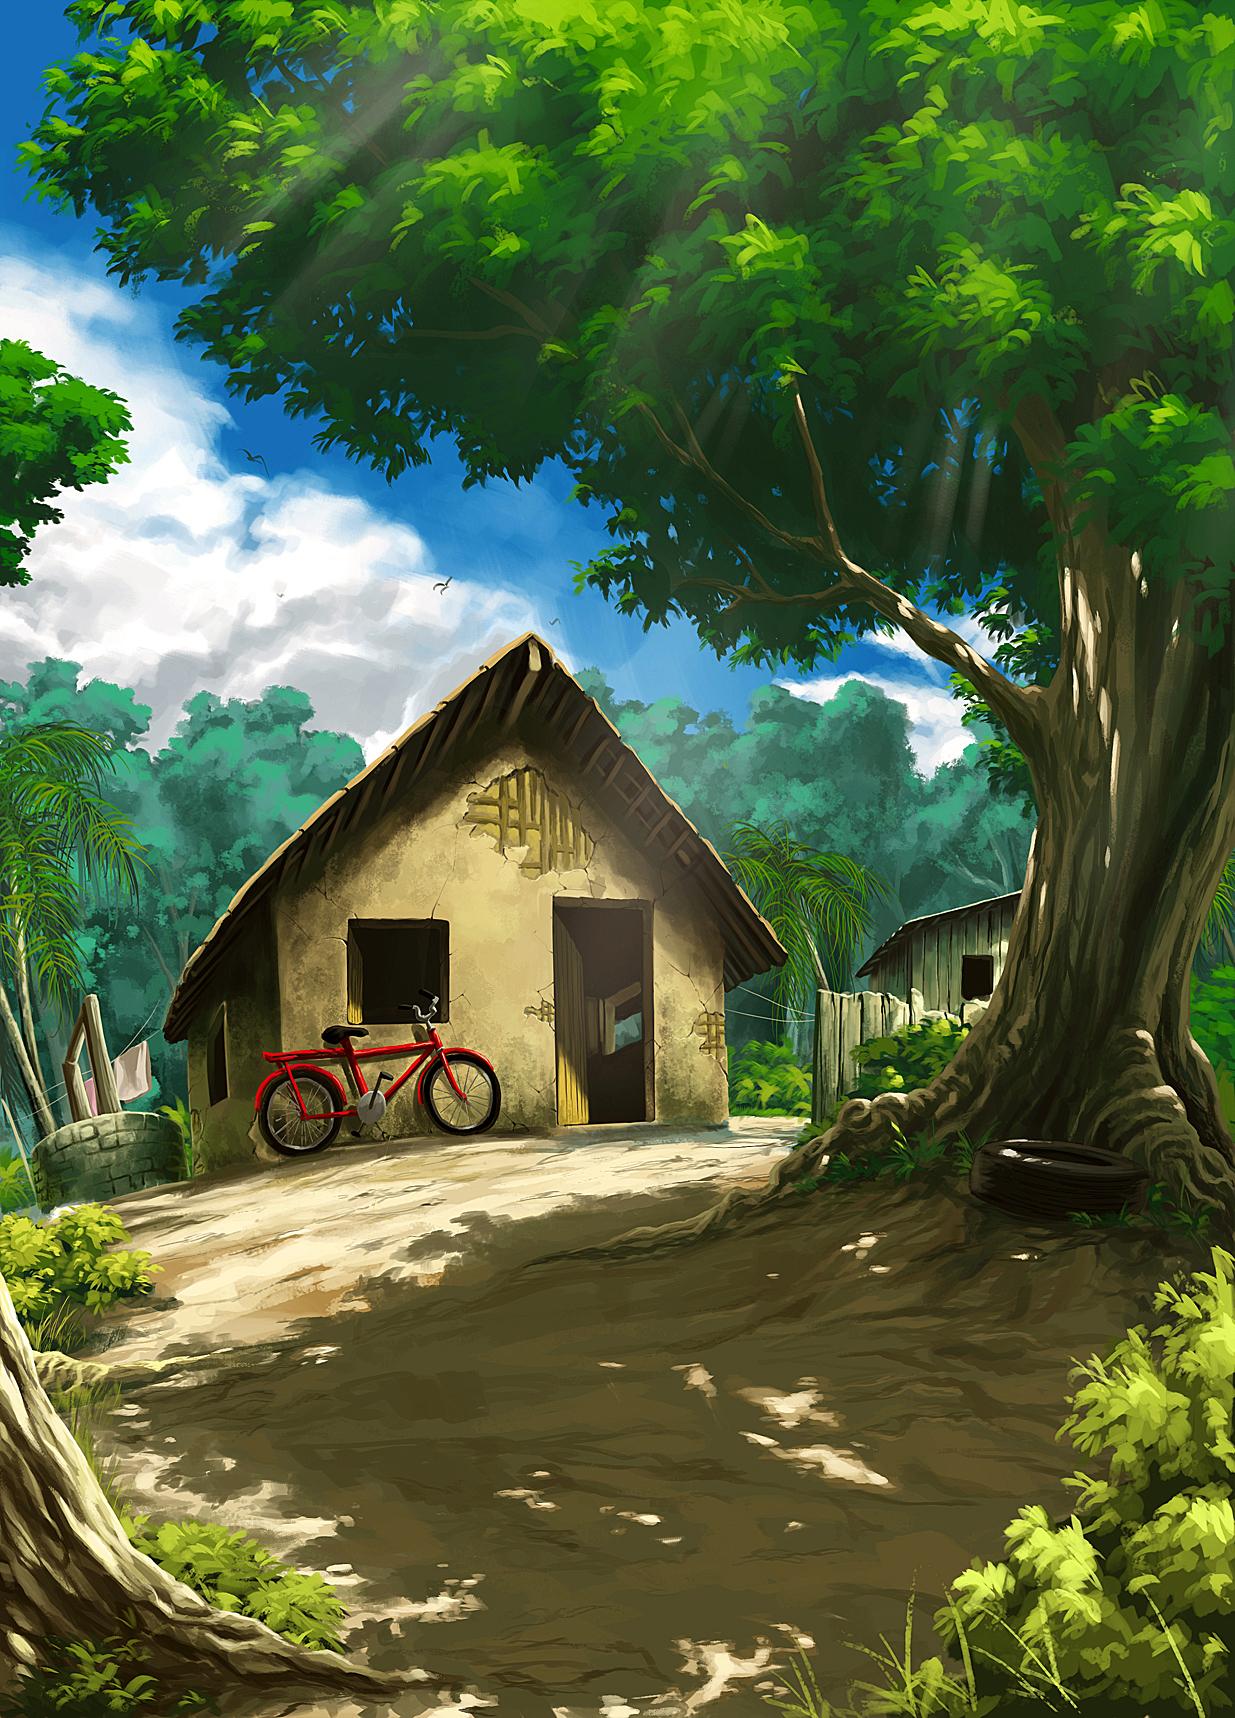 A little scene... by fernandocarvalho